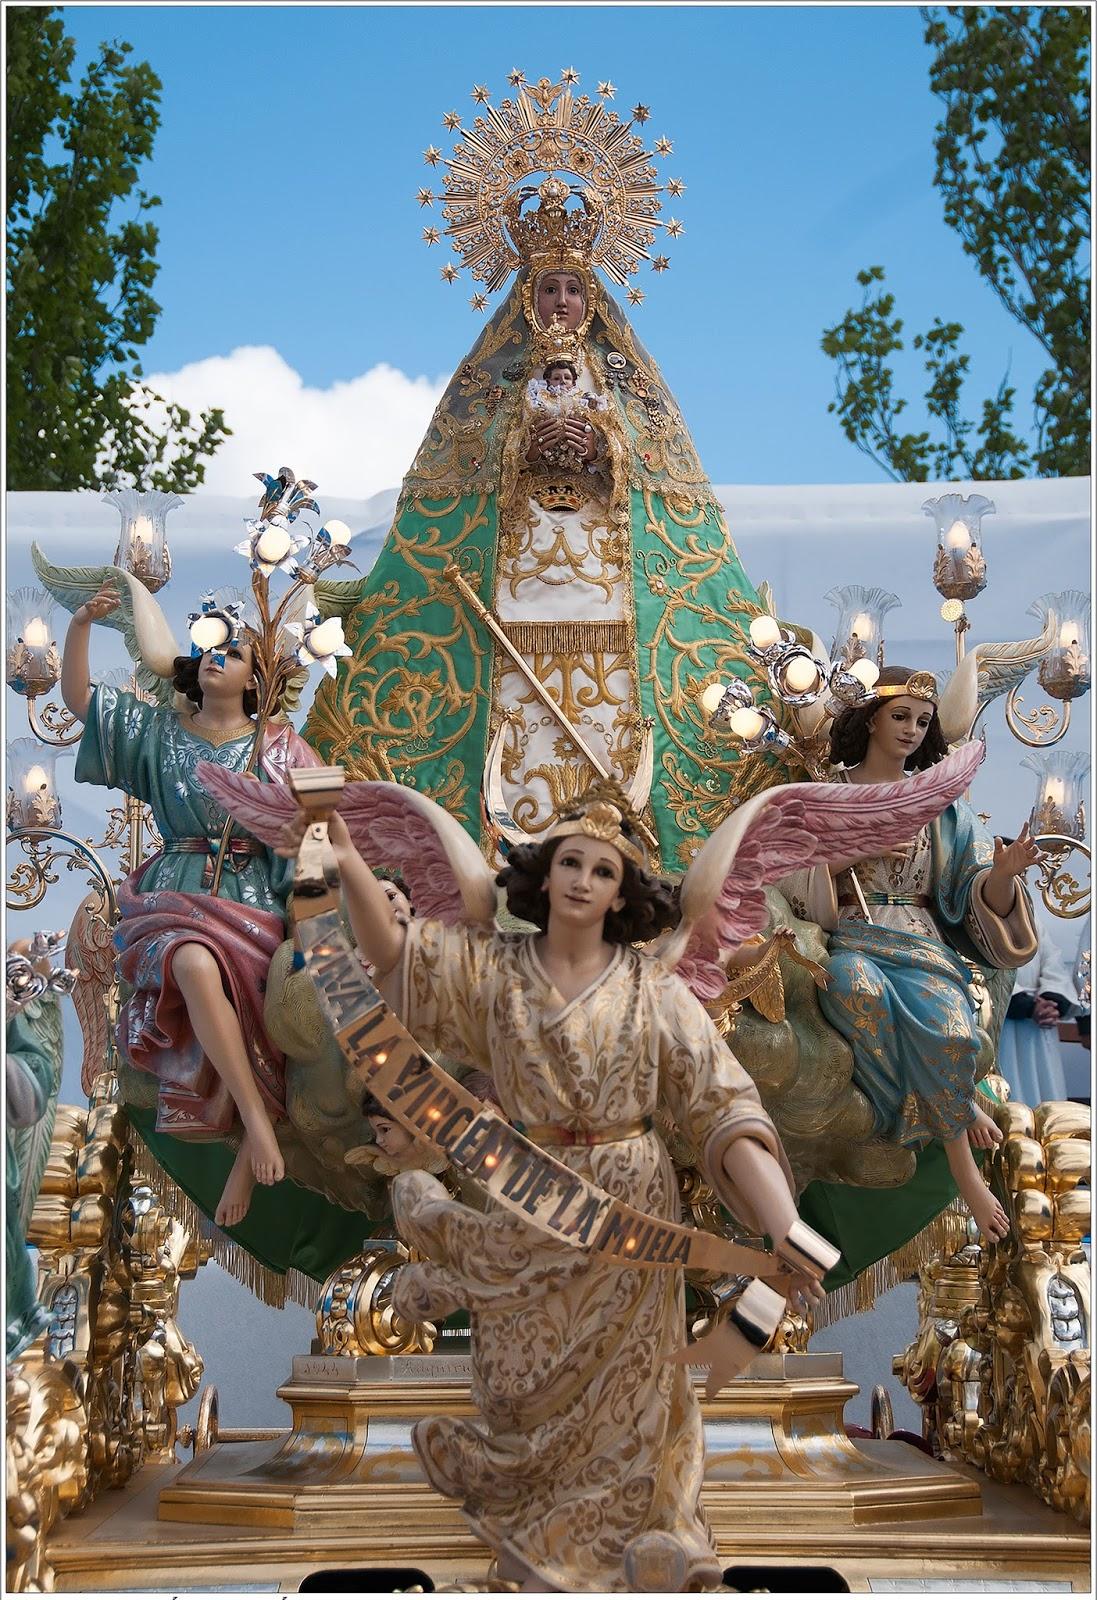 Historia de corral de almaguer estudio hist rico - Corral de almaguer fotos ...